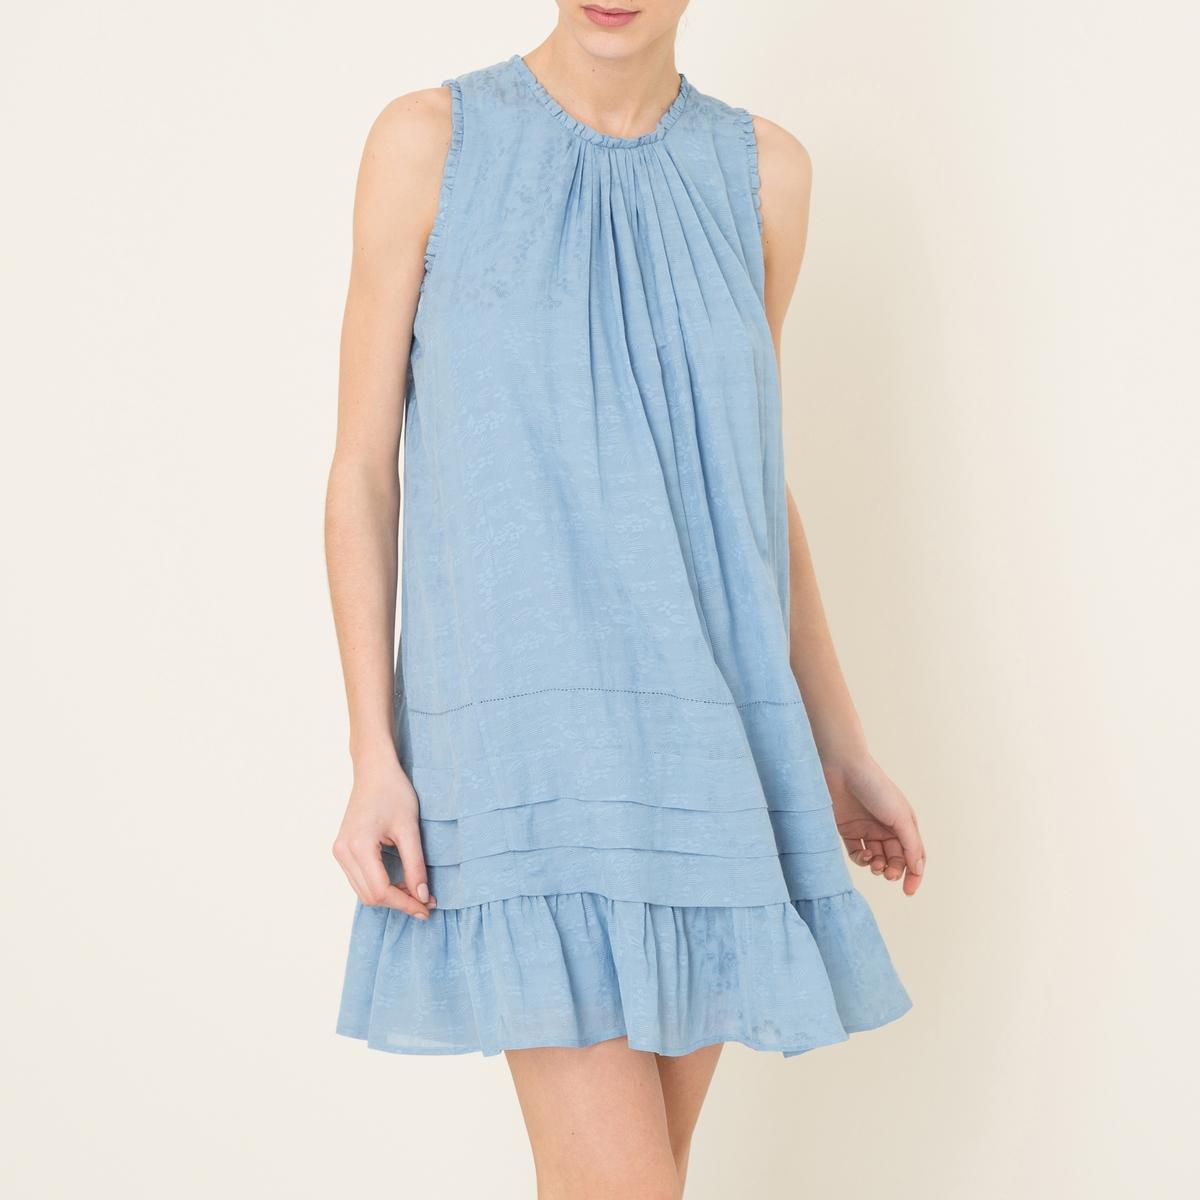 Платье LILIANAСостав и описание Материал : 100% вискозаДлина : ок. 91 см. для размера 36Марка : PAUL AND JOE SISTER<br><br>Цвет: синий